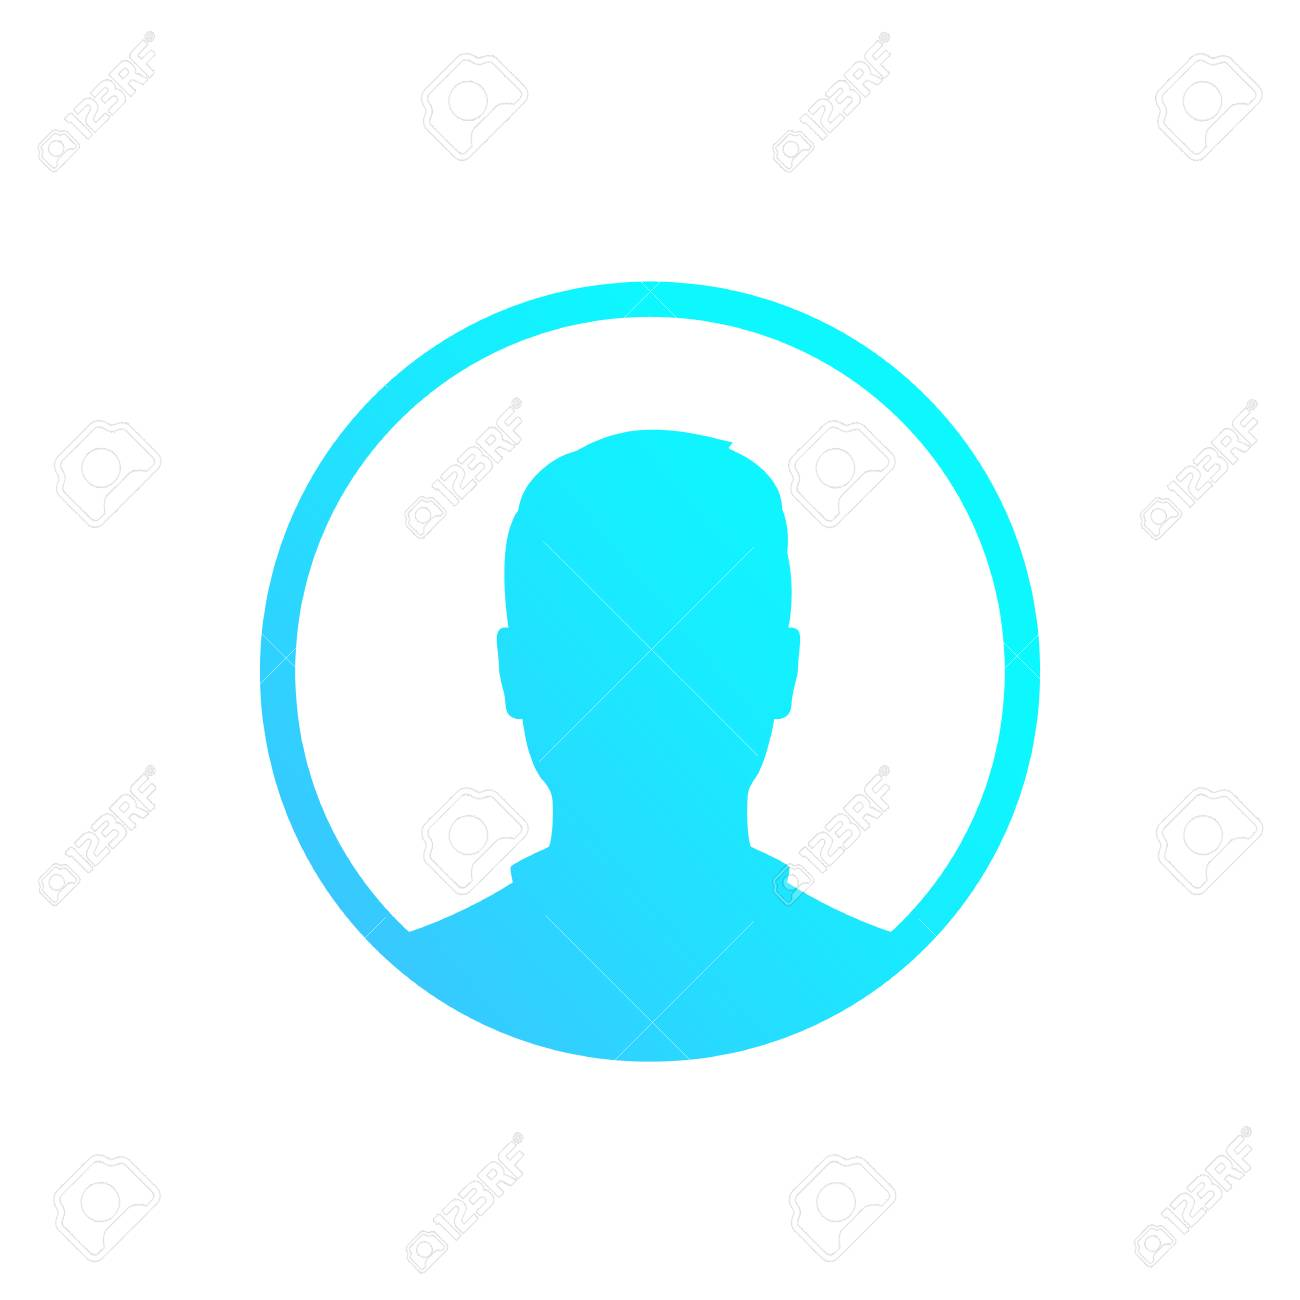 Default avatar, placeholder, profile icon, male